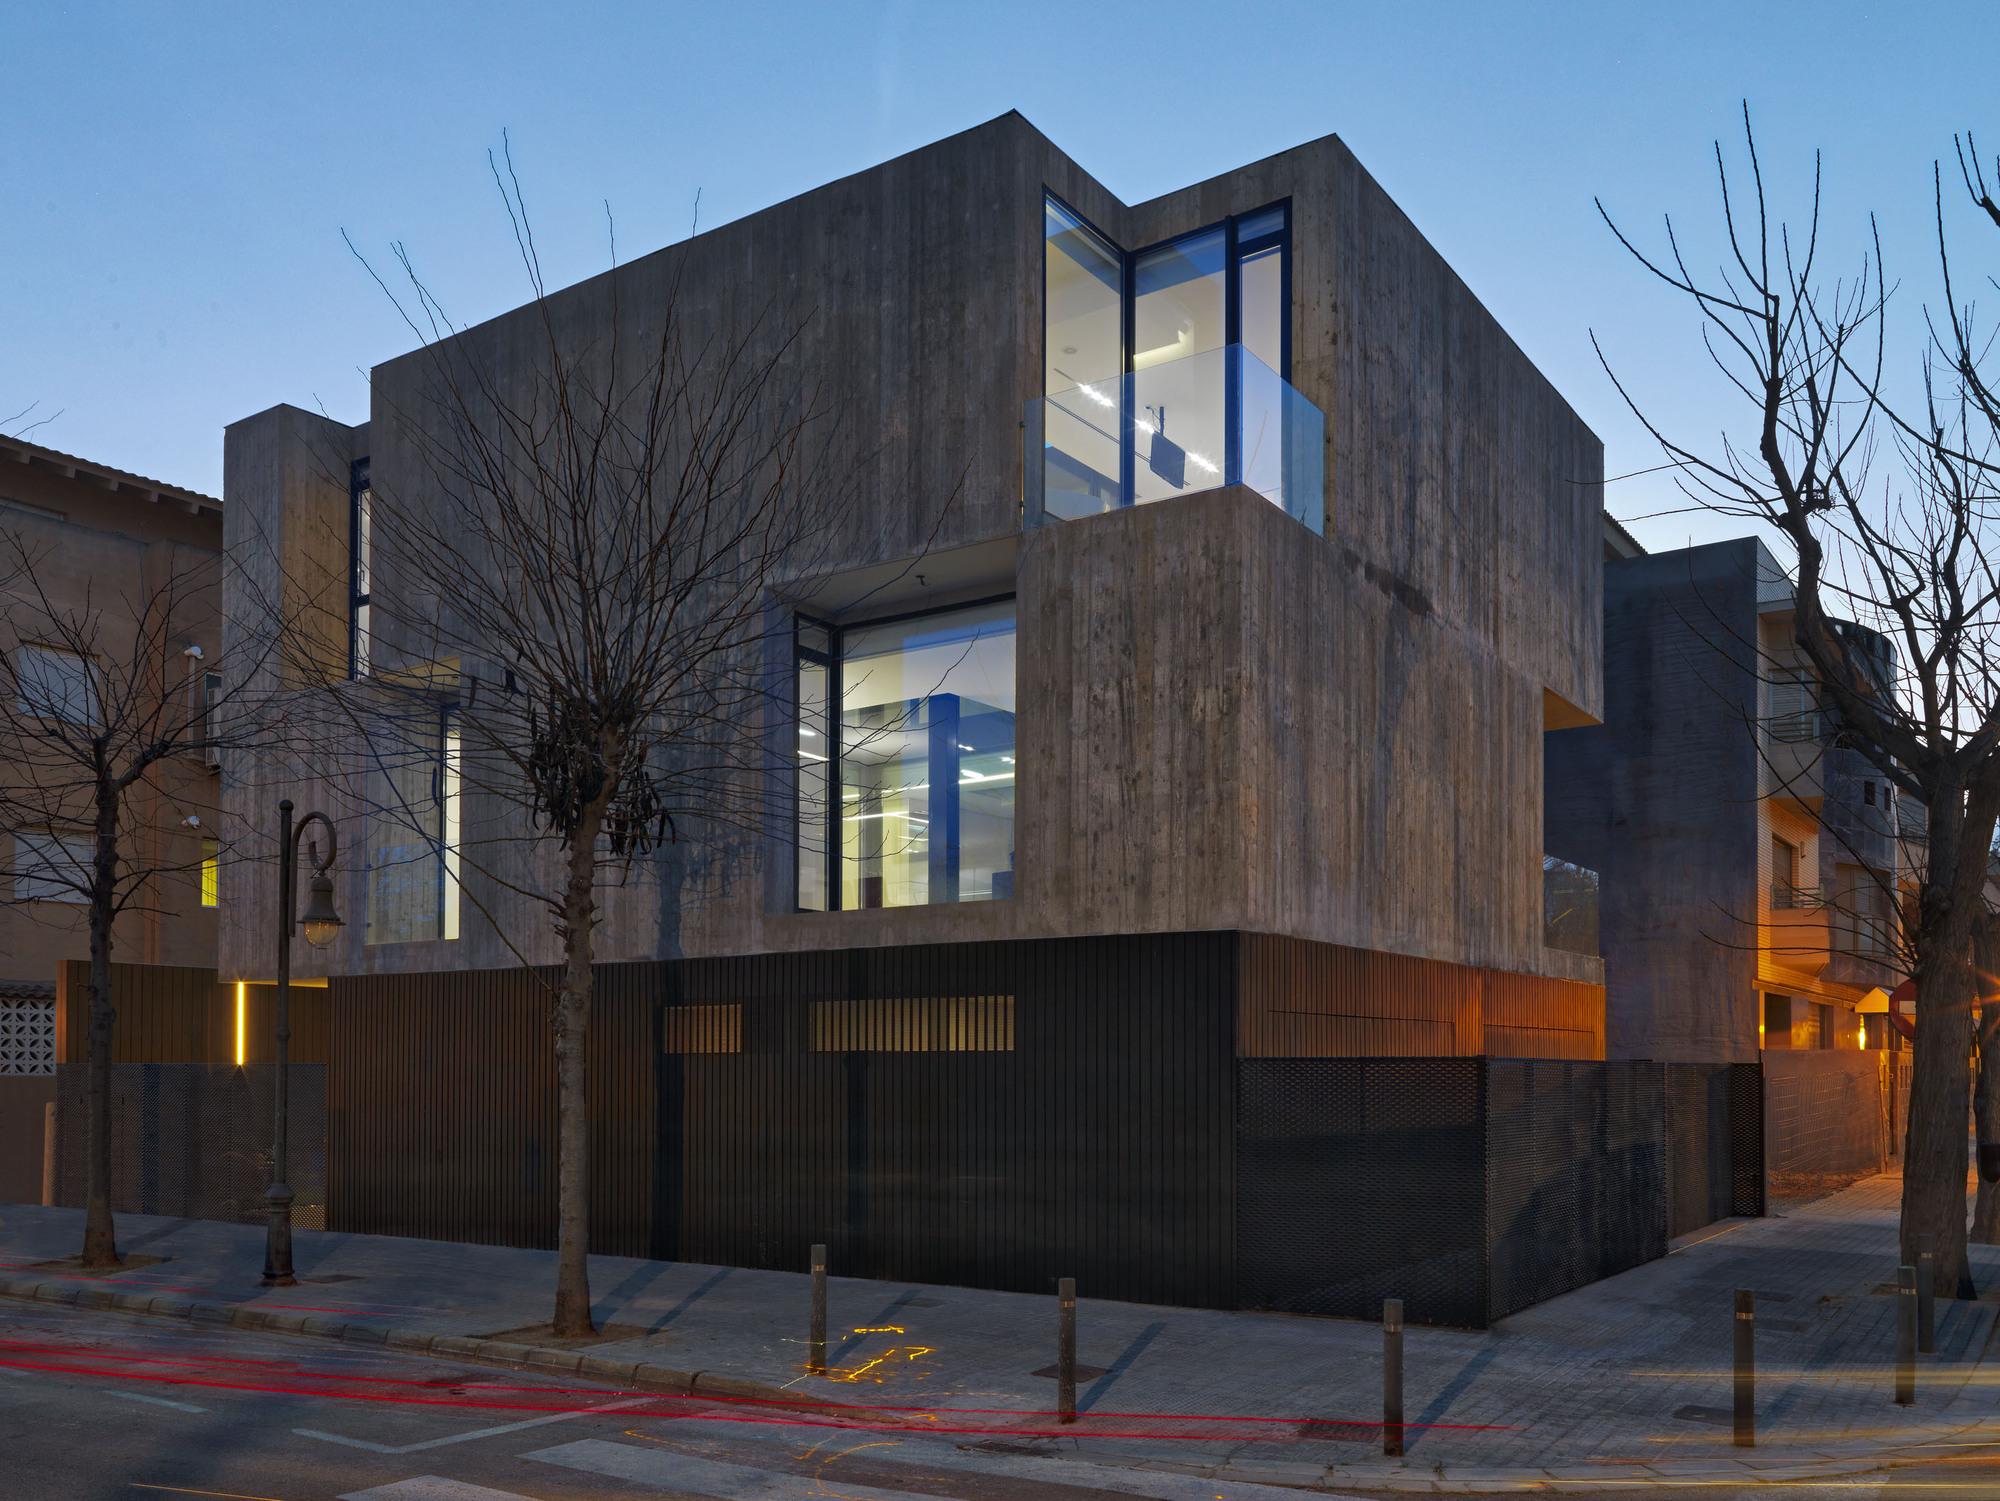 Casa concreto ruben muedra estudio de arquitectura for Arquitectura casa